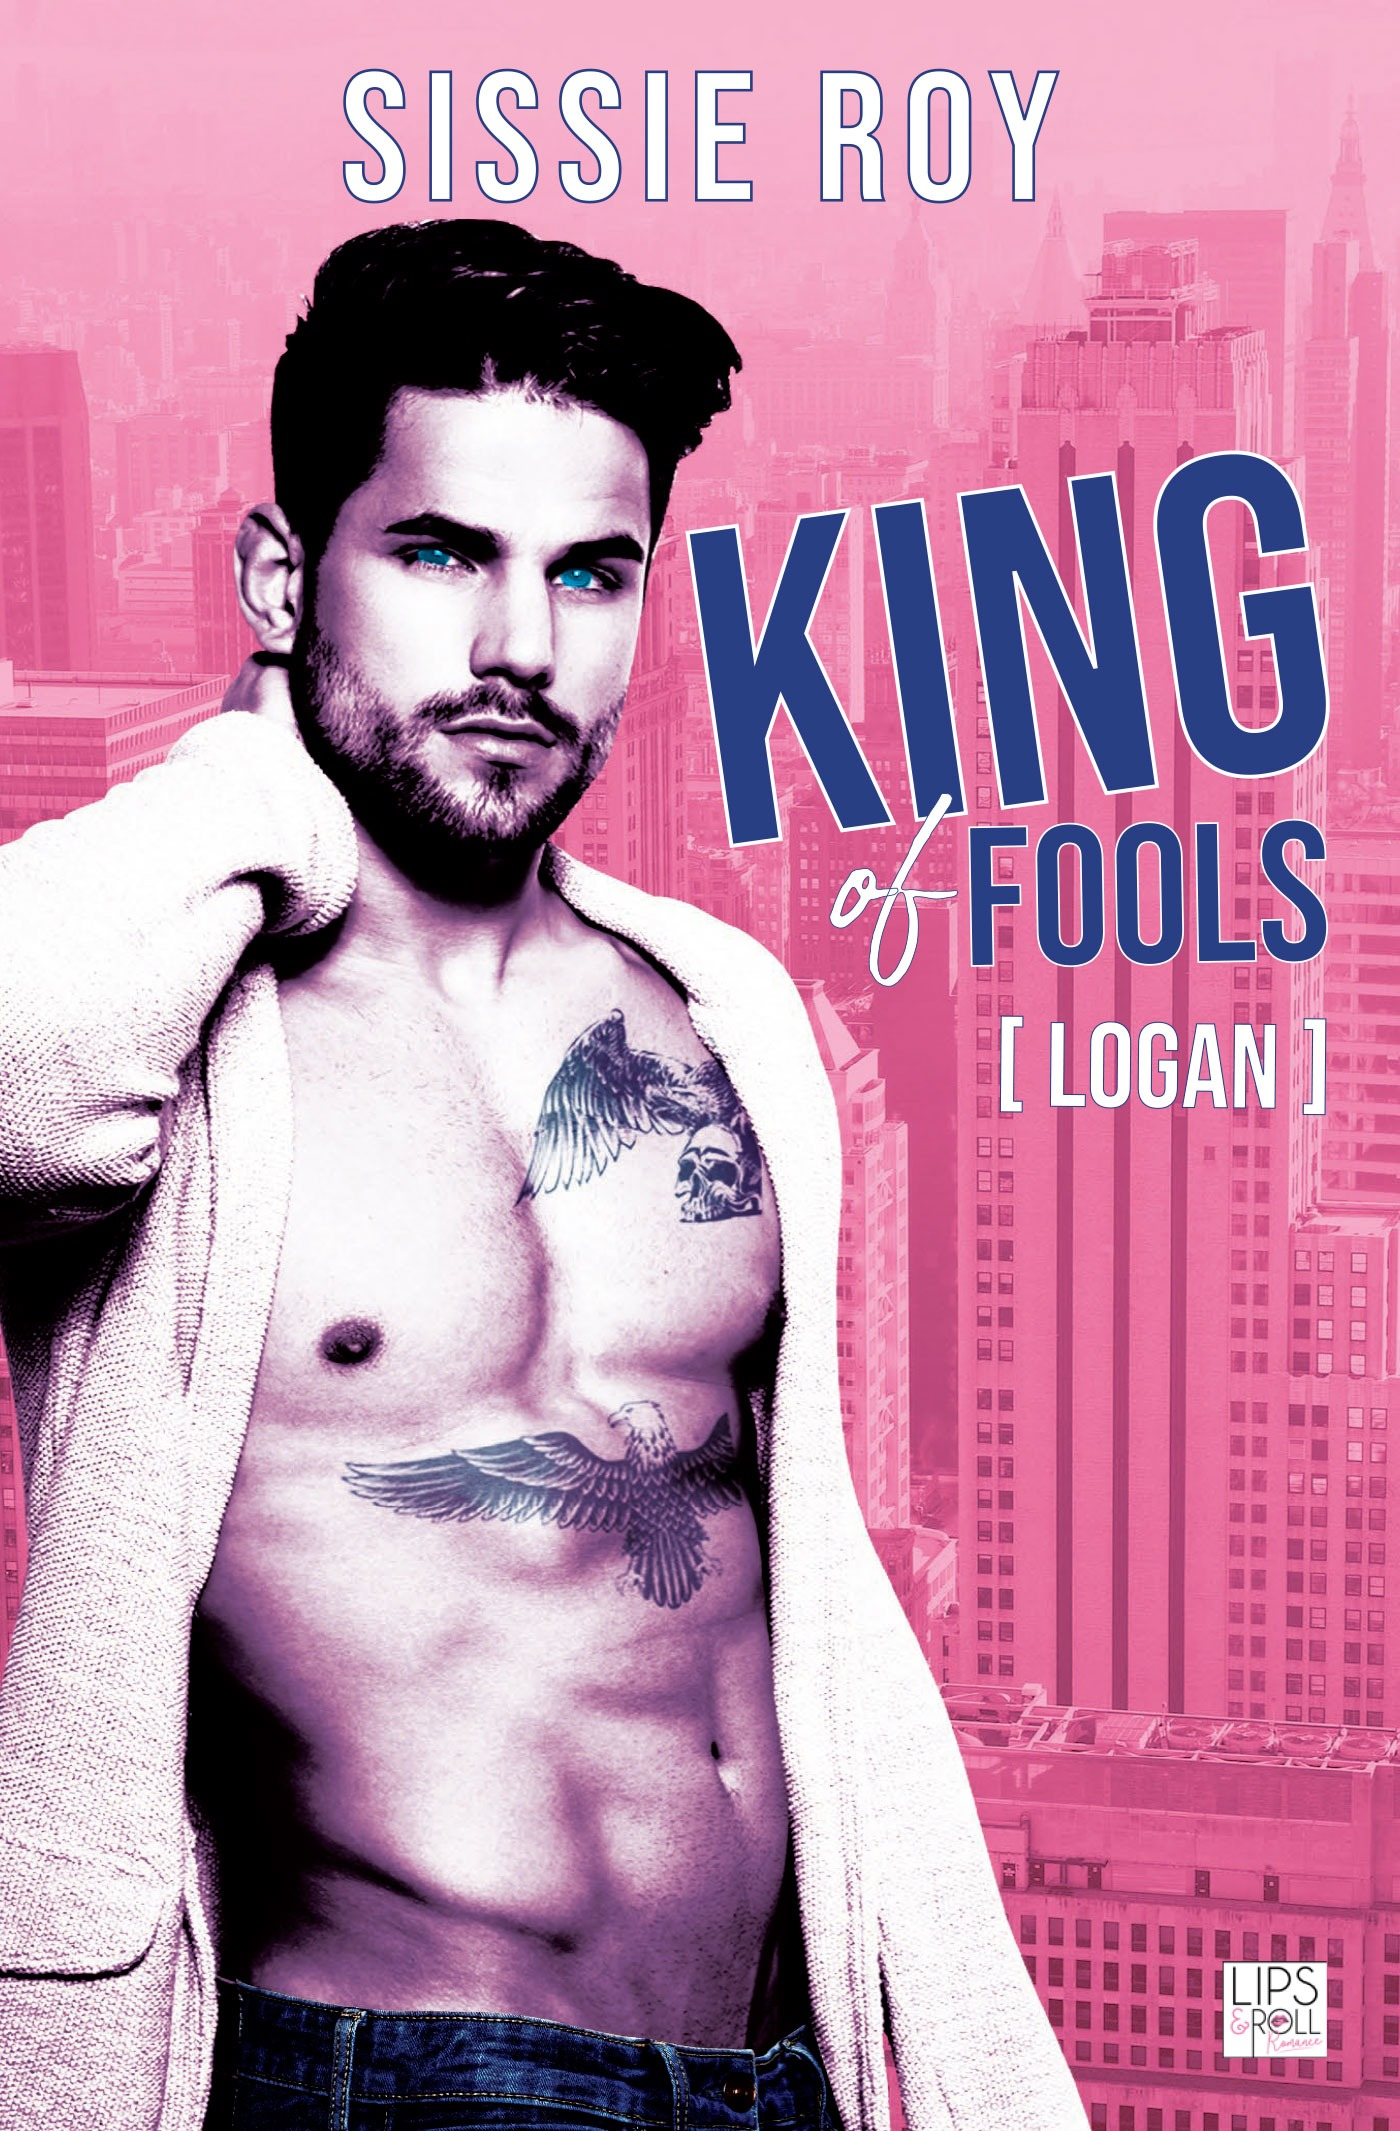 King of fools - Logan